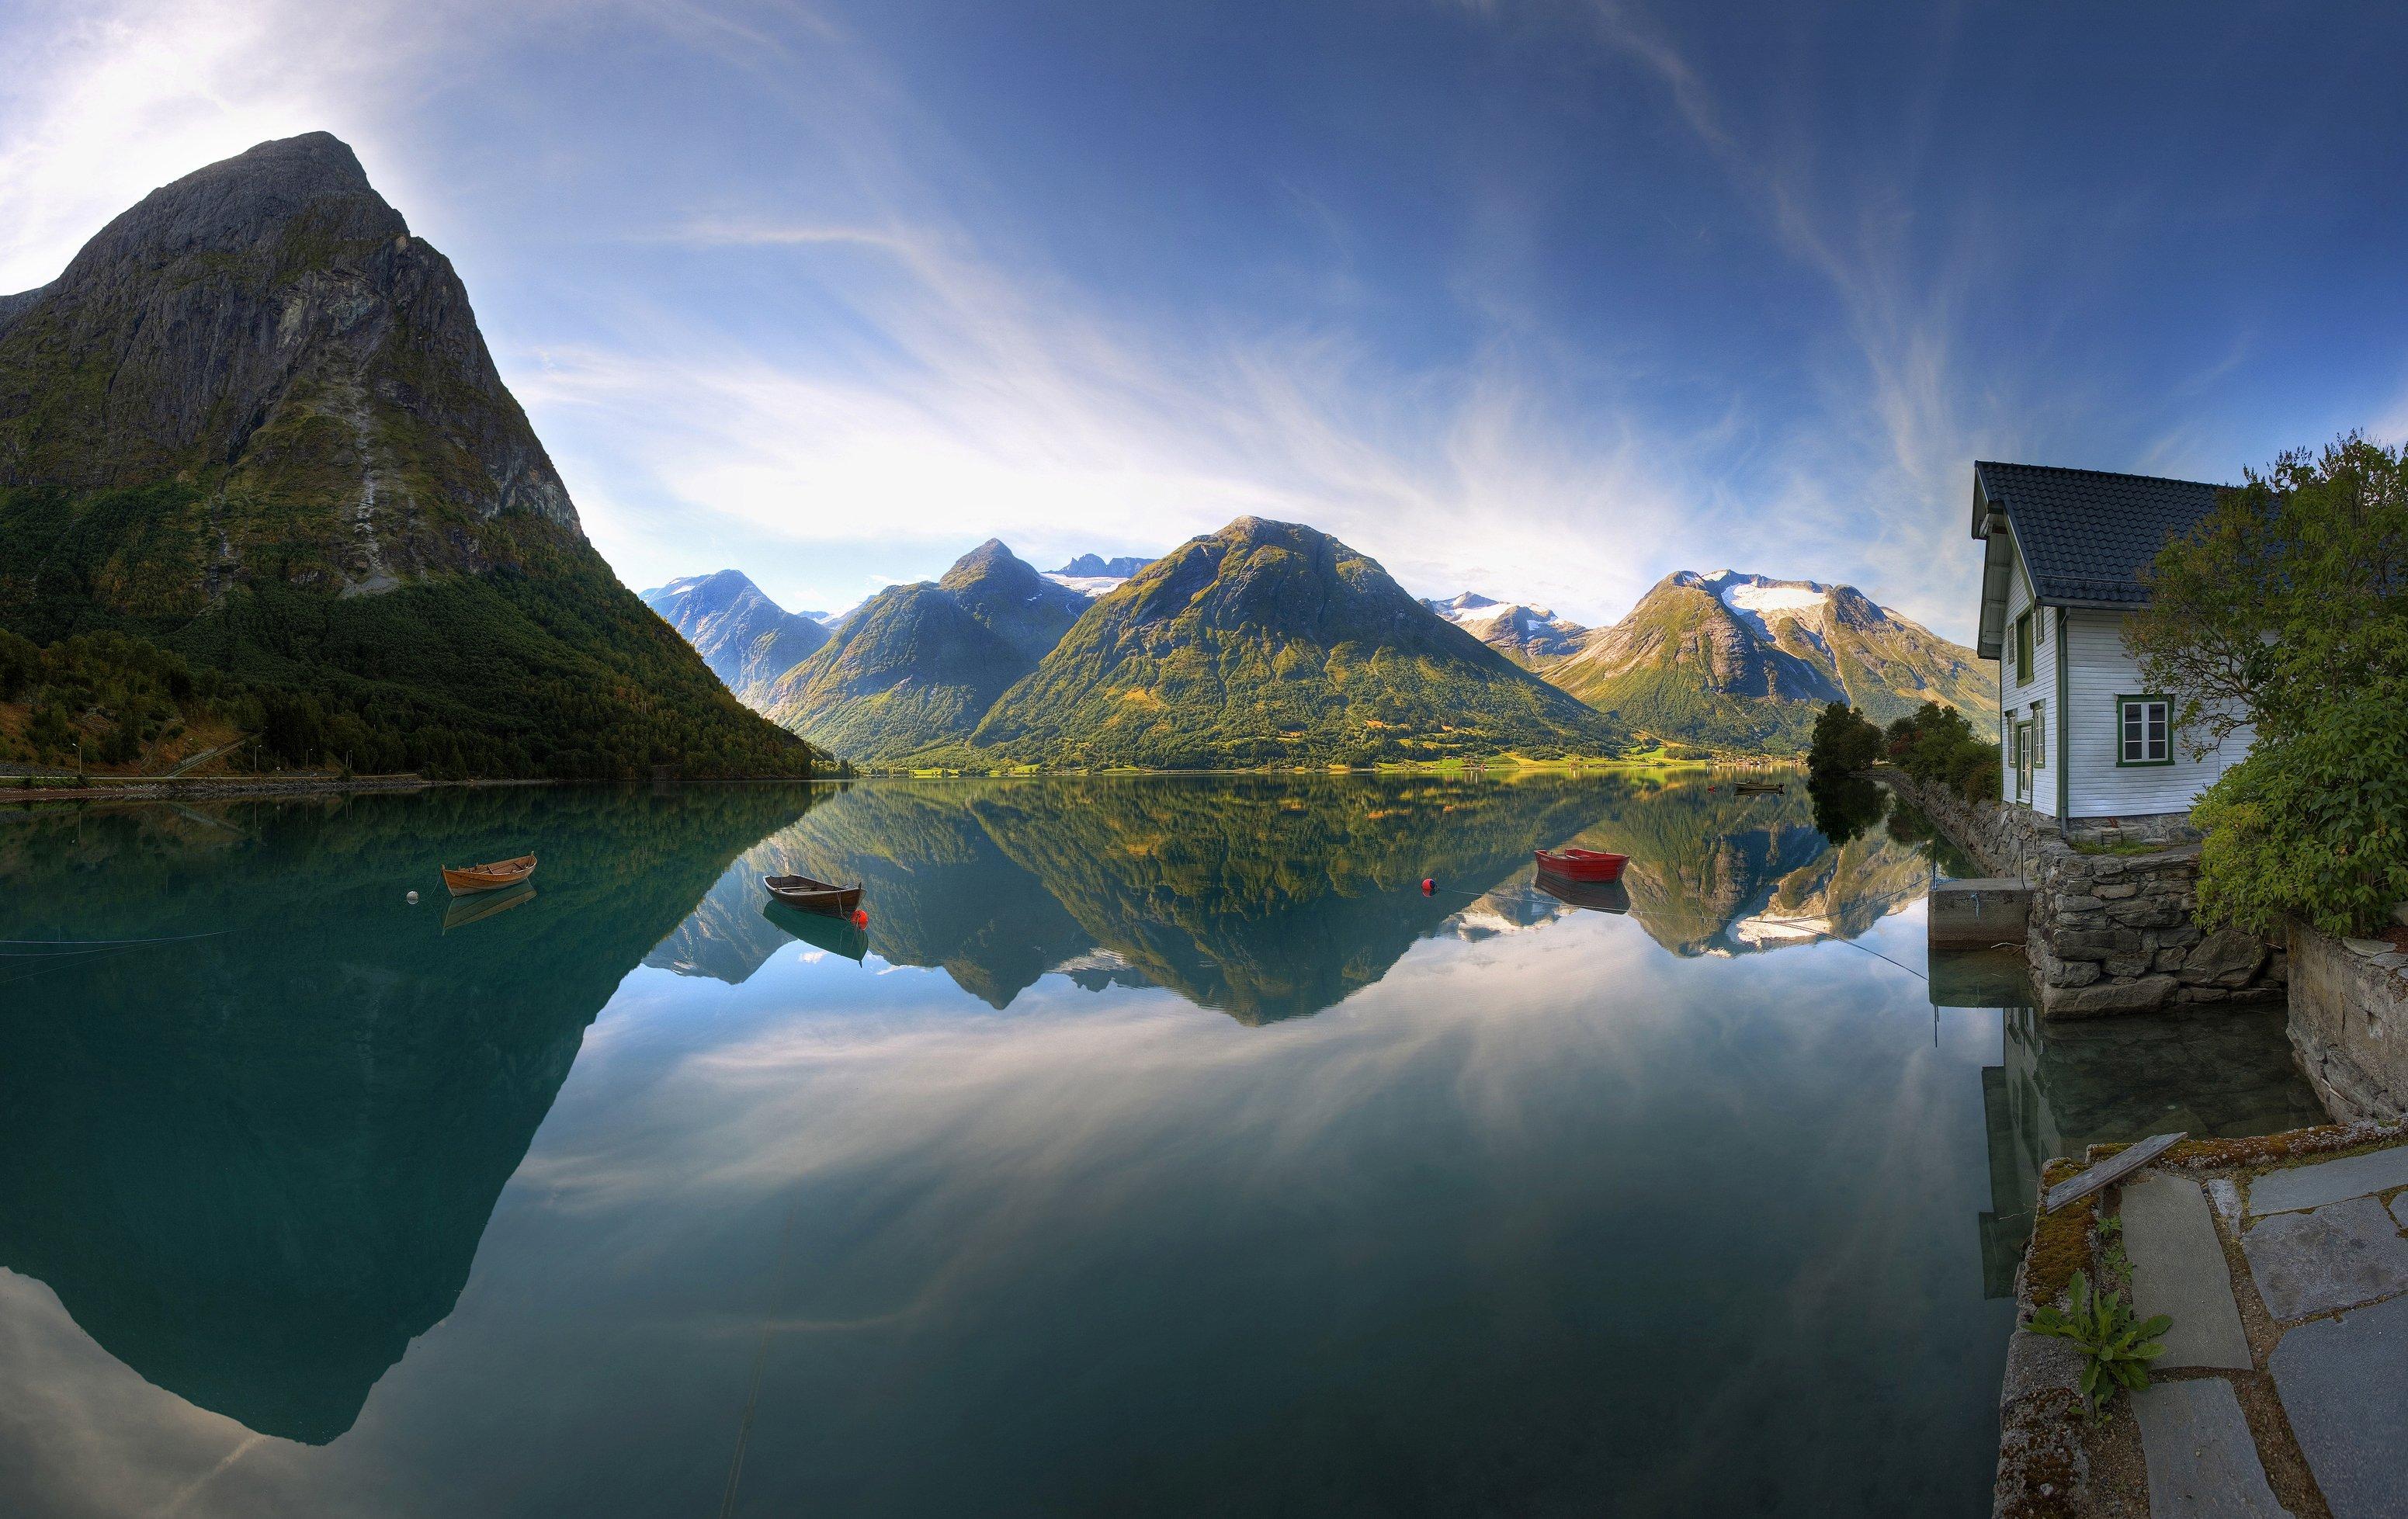 Serenity In Norway Hd Wallpaper